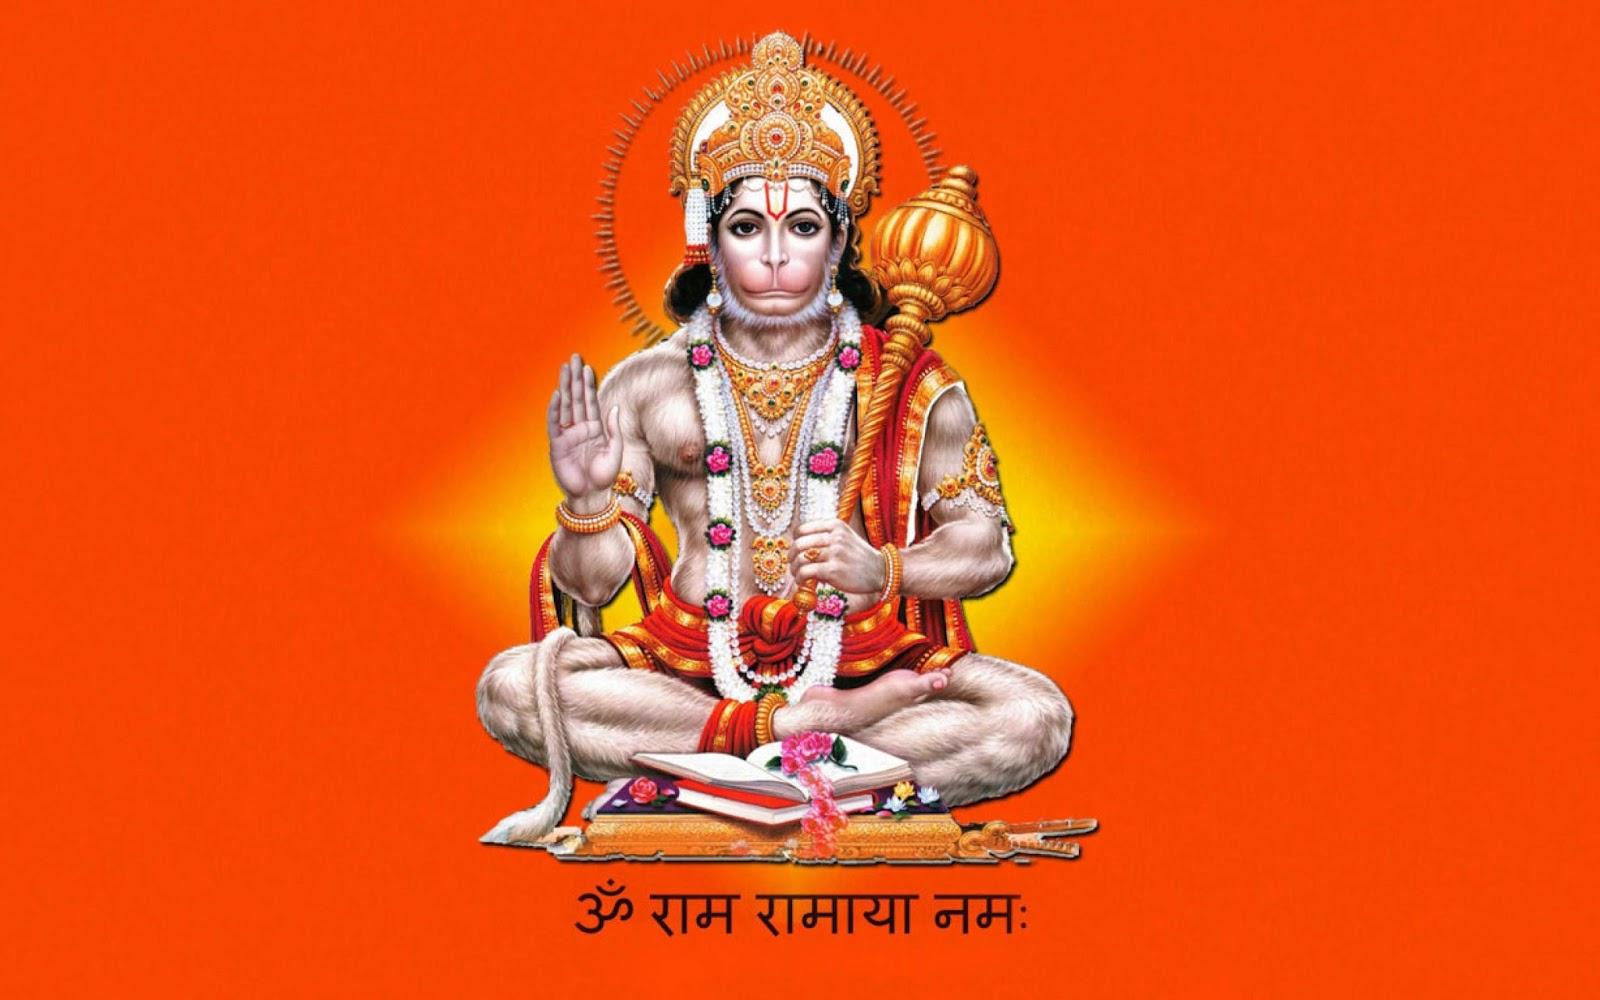 free hanuman ji Good Morning Wallpaper 2021 1